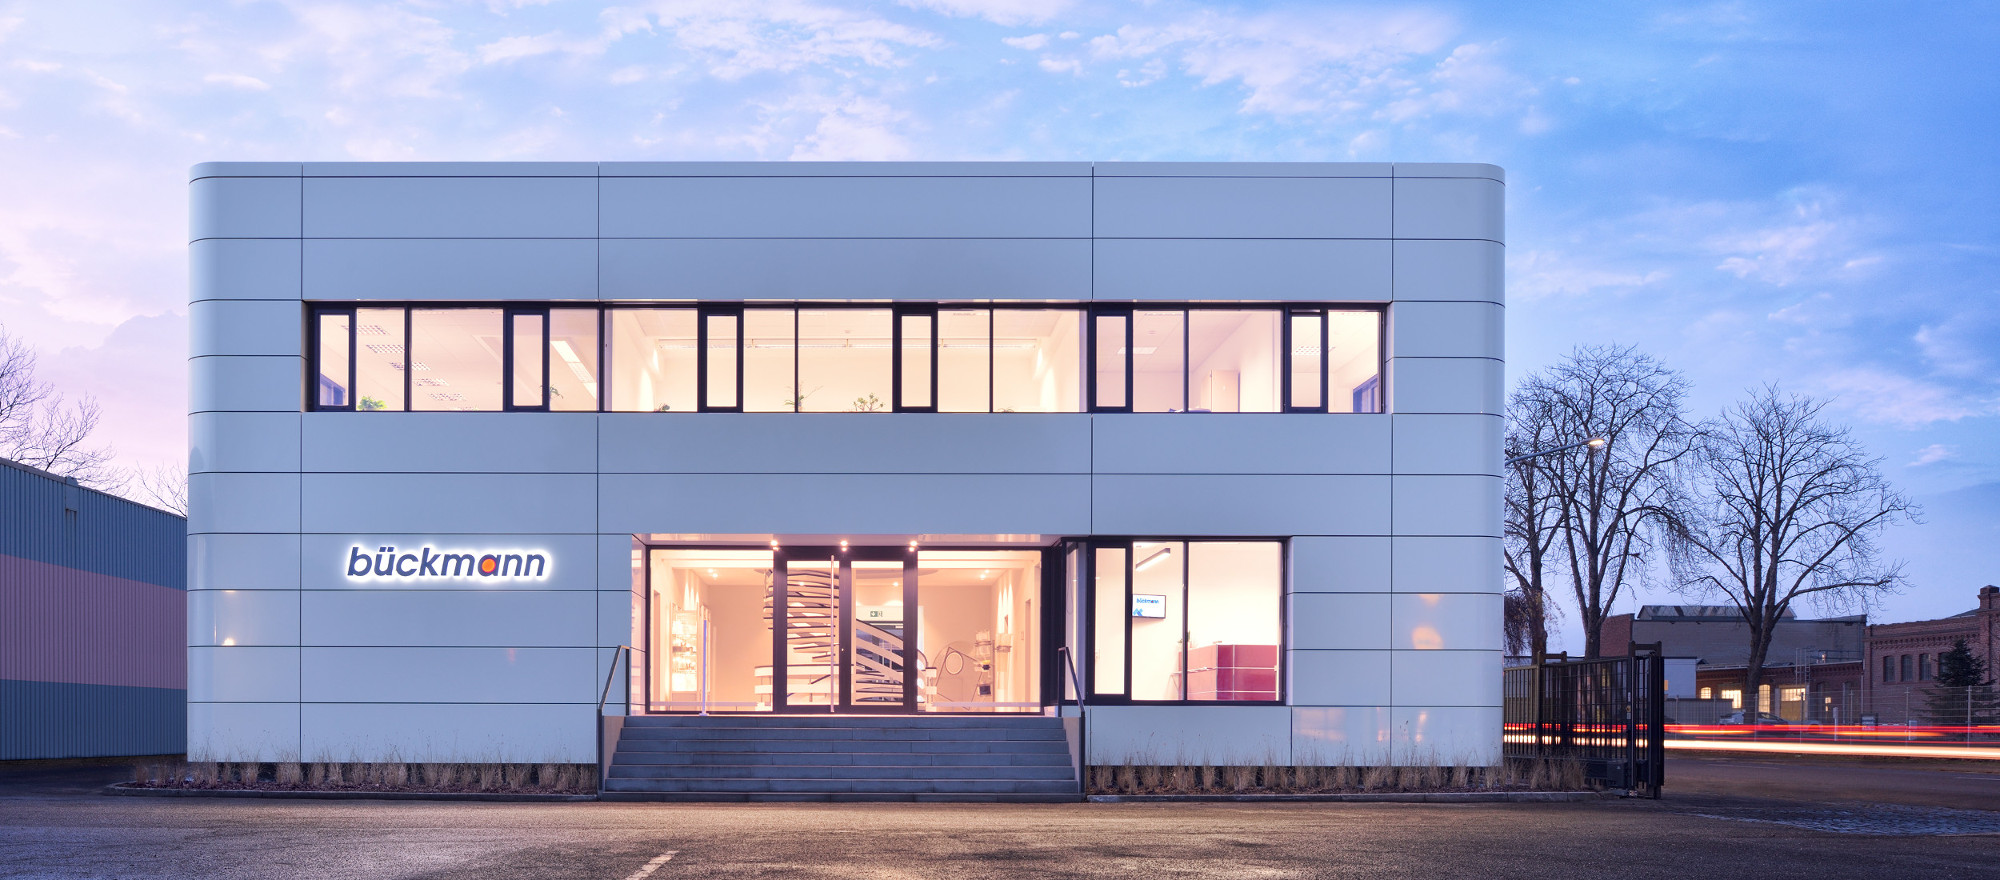 Verwaltung Bückmann GmbH